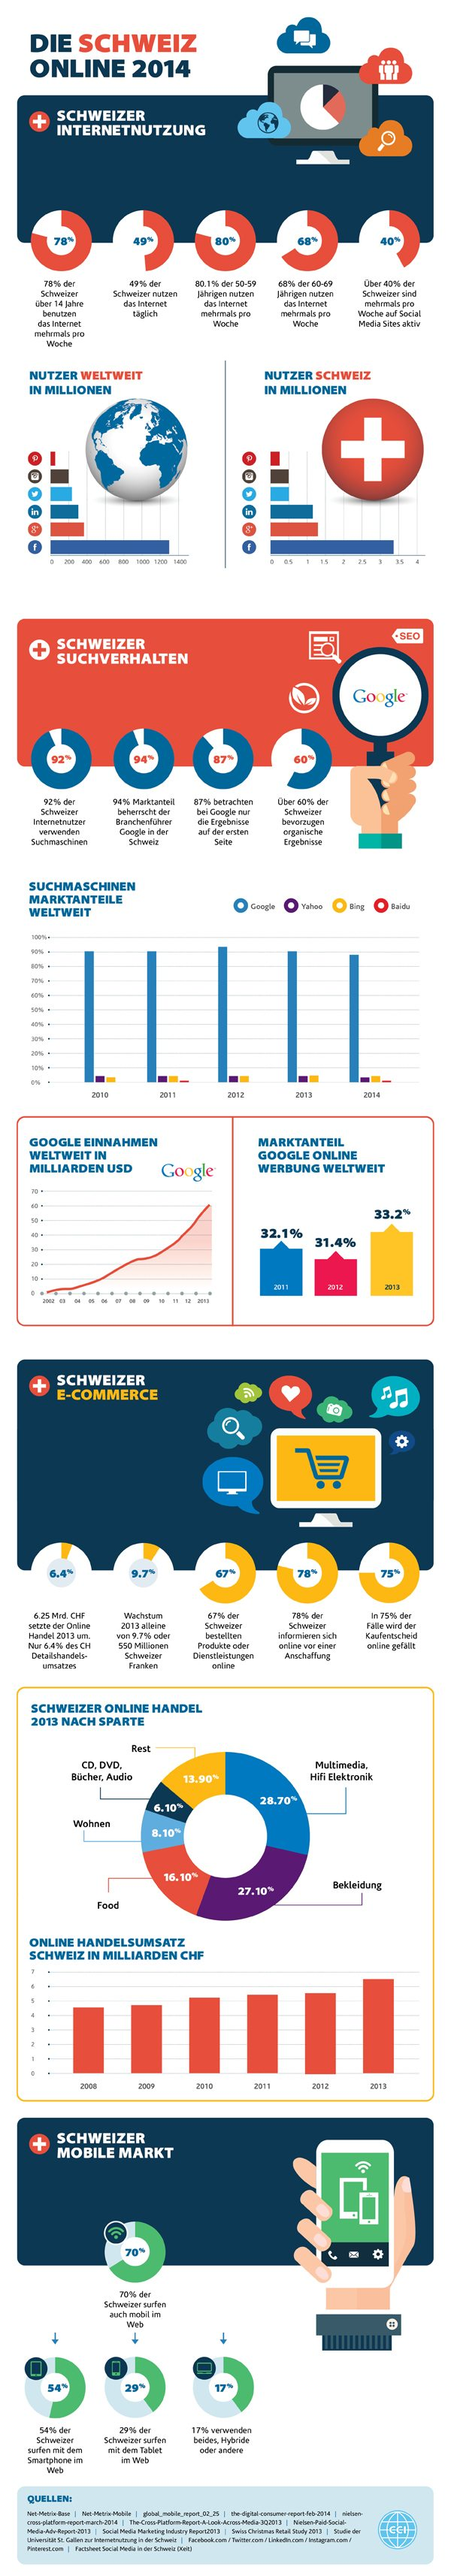 Infographic Switzerland online 2014